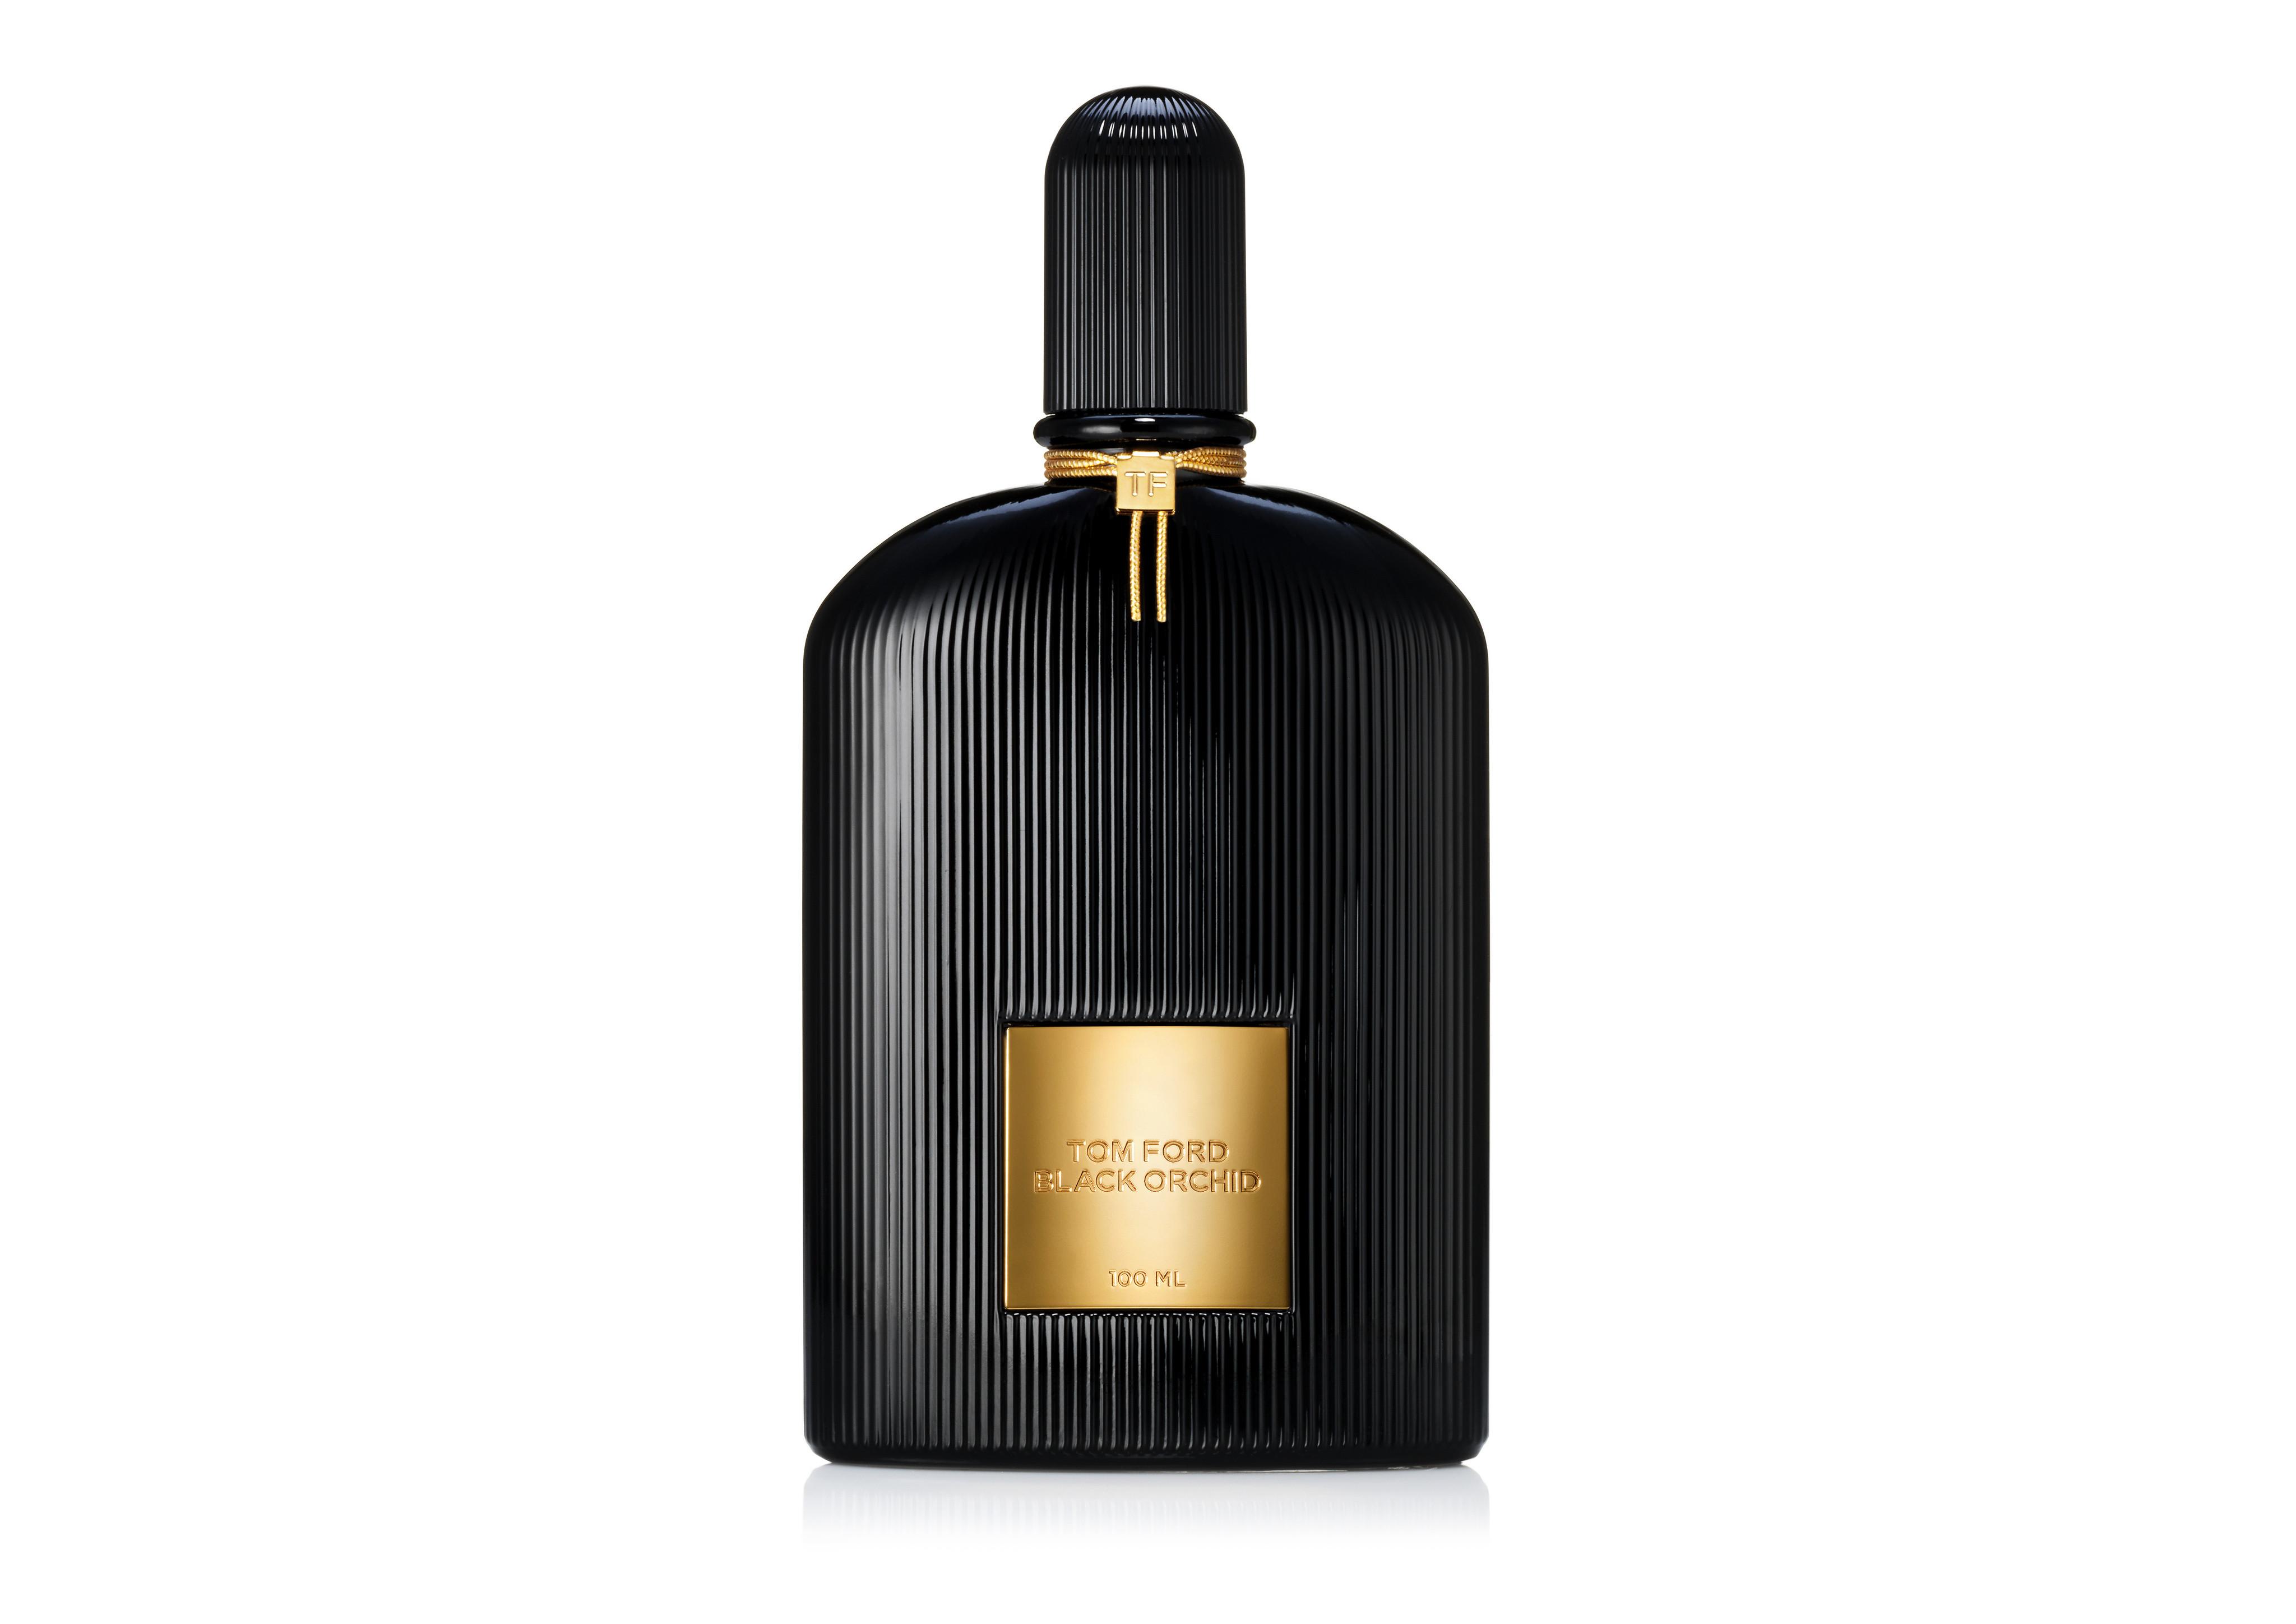 Tom Ford Black Orchid eau de parfum 100 ml, Trasparente, large image number 0